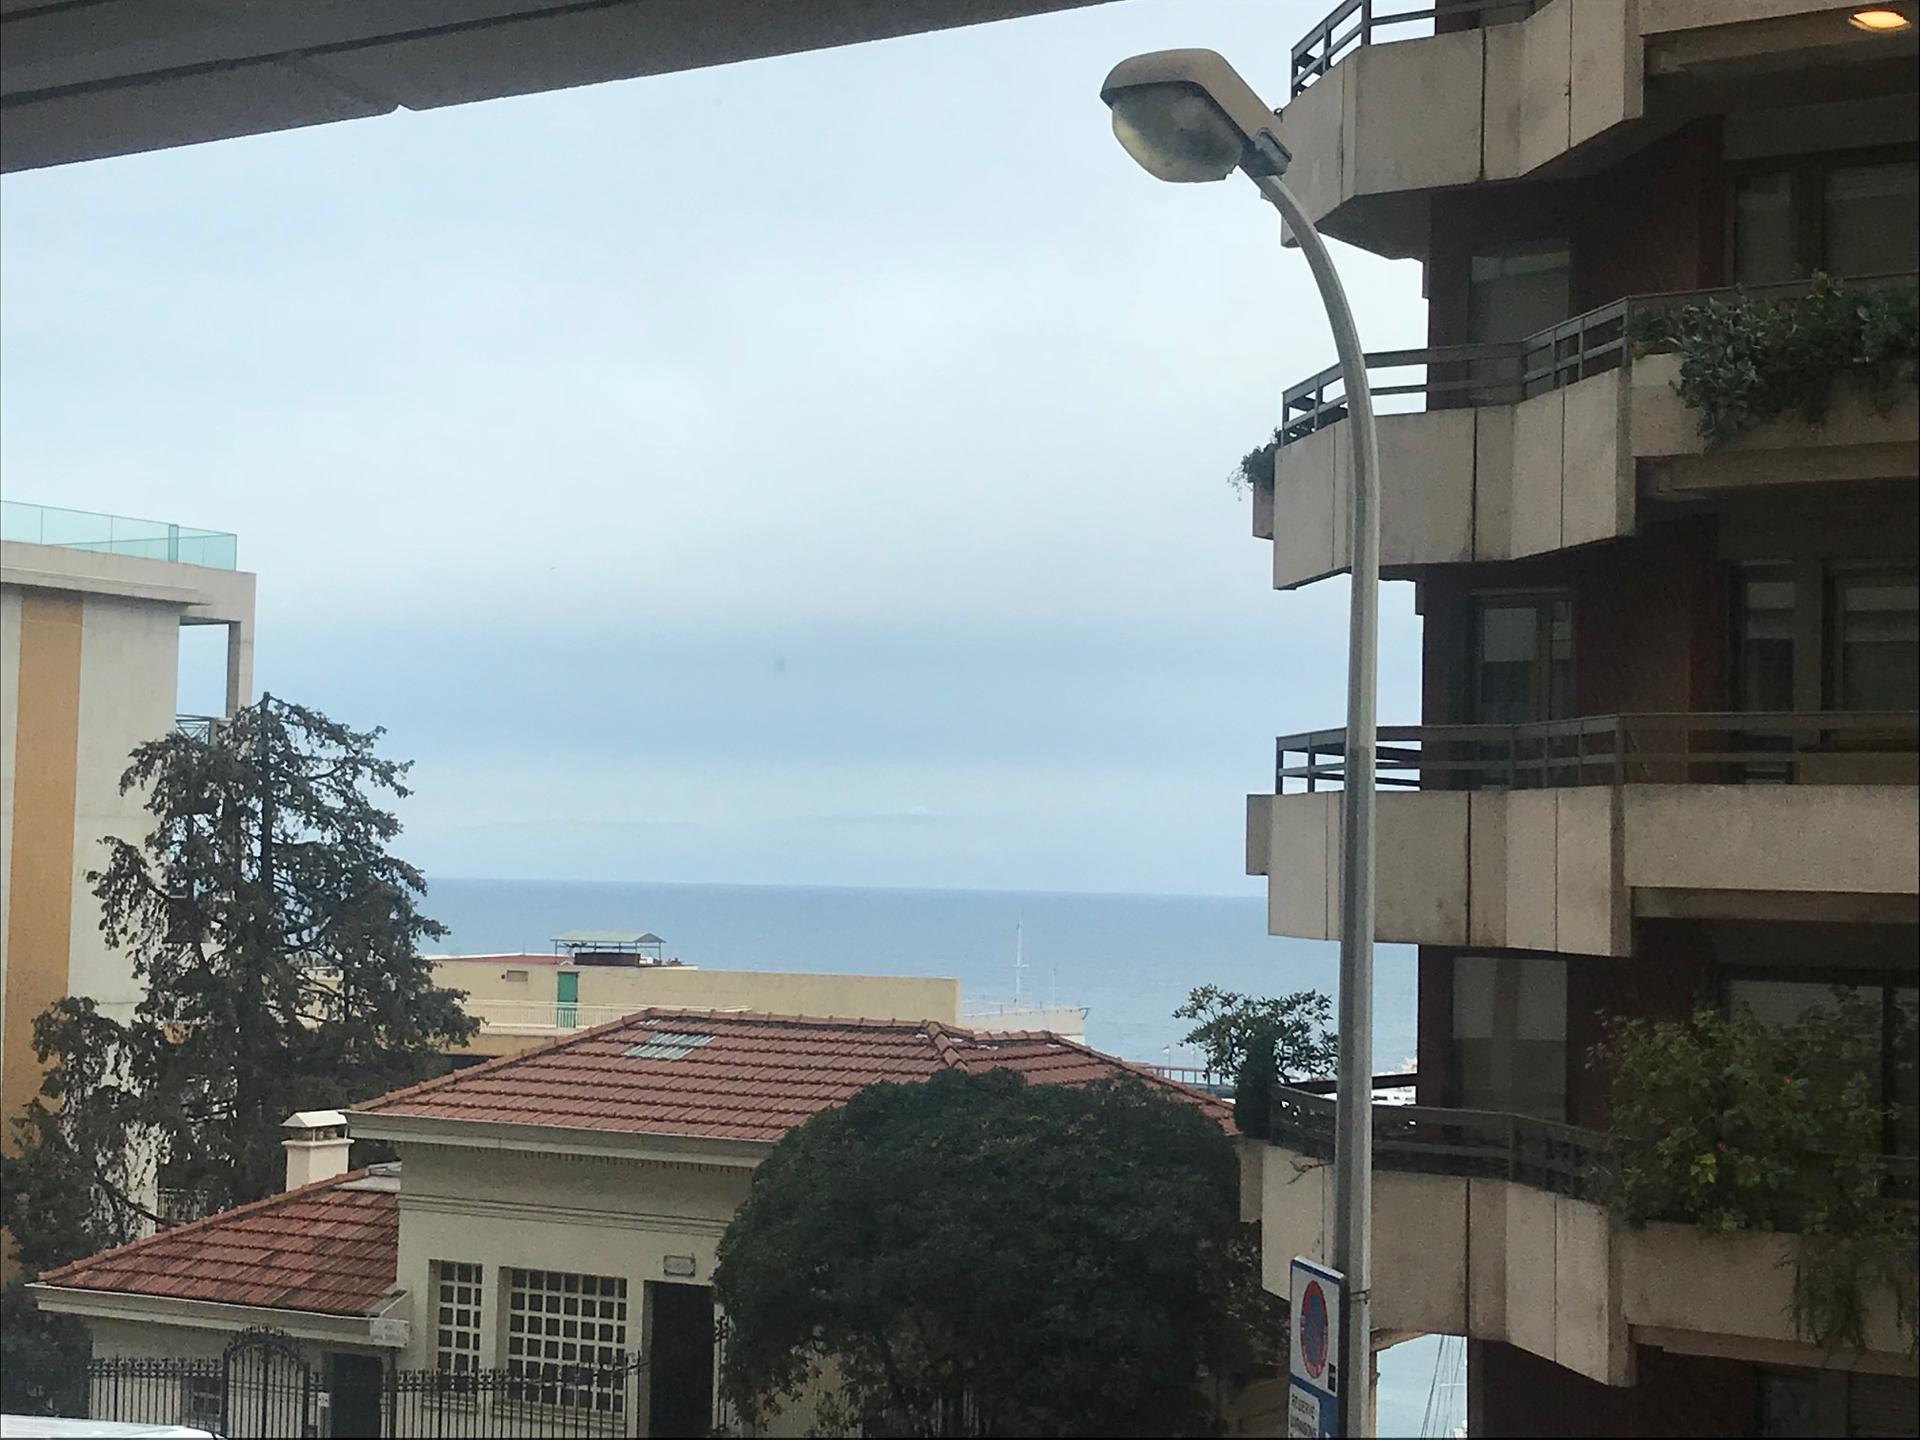 STUDIO USAGE MIXTE HERAKLEIA - Bureaux à vendre à Monaco